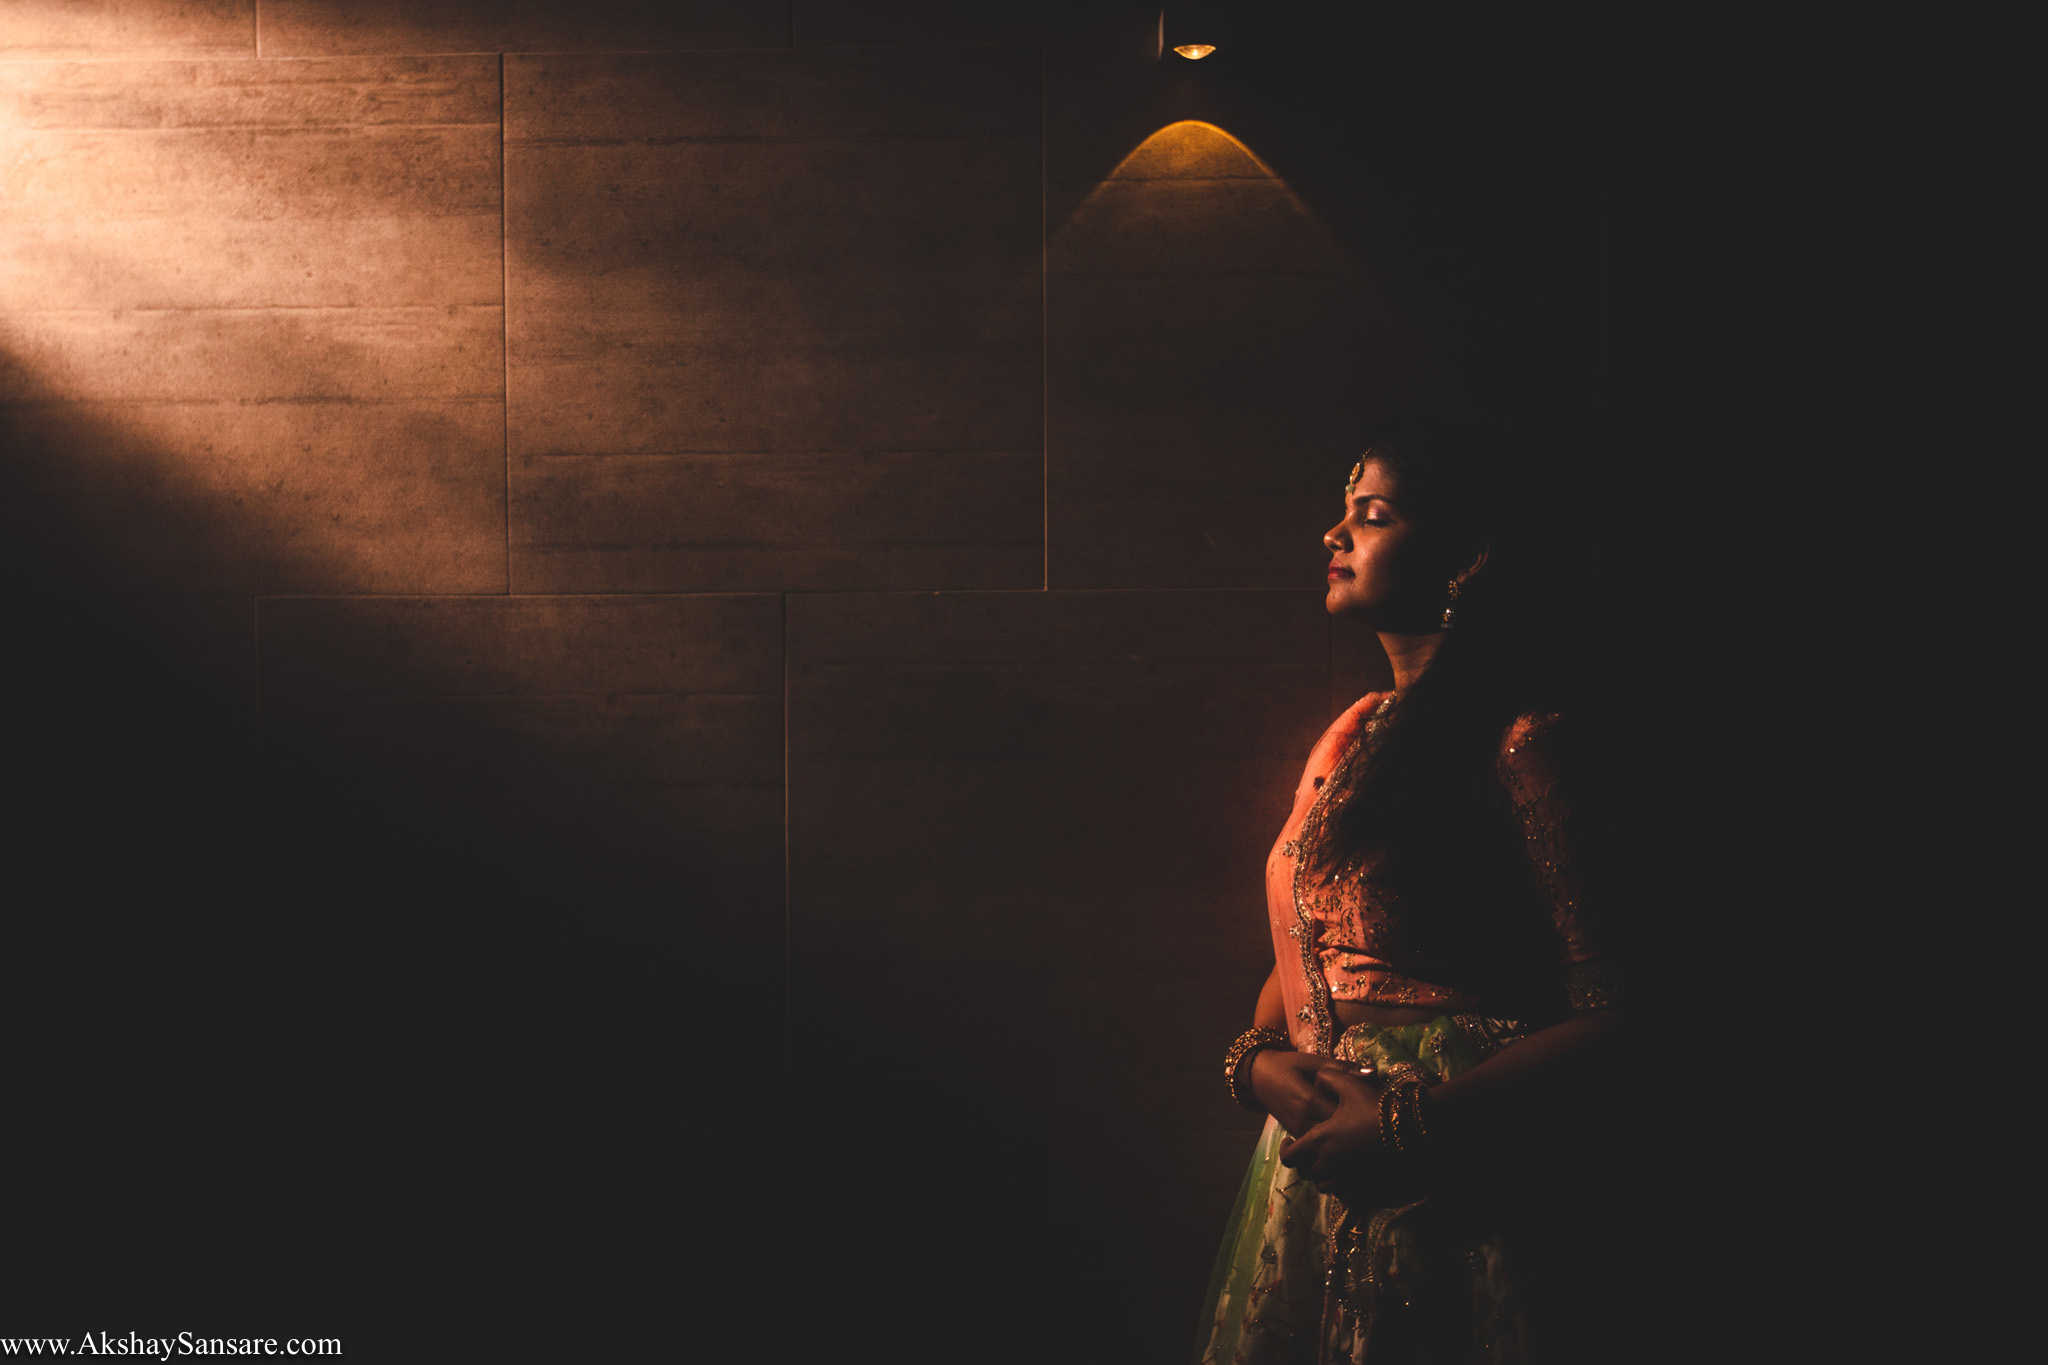 Salil x Kimaya Akshay Sansare Photography Candid wedding Photographer in mumbai best(2).jpg